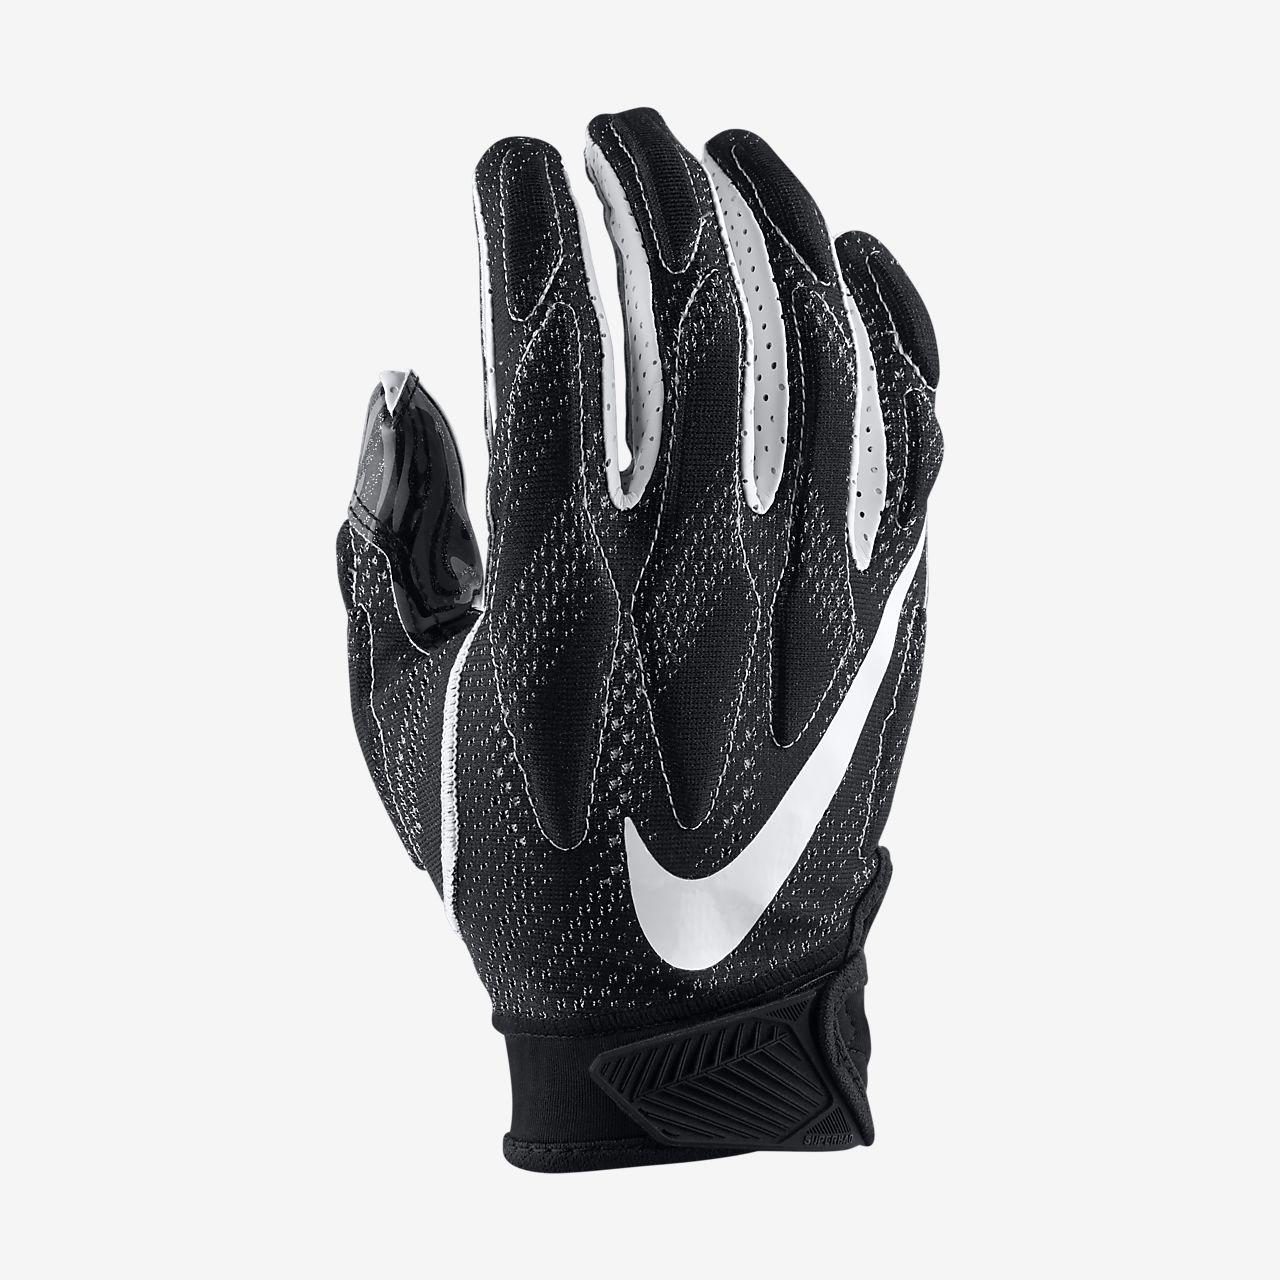 6d3c94e8ef7 Nike Superbad 4.5 Kids' Football Gloves. Nike.com